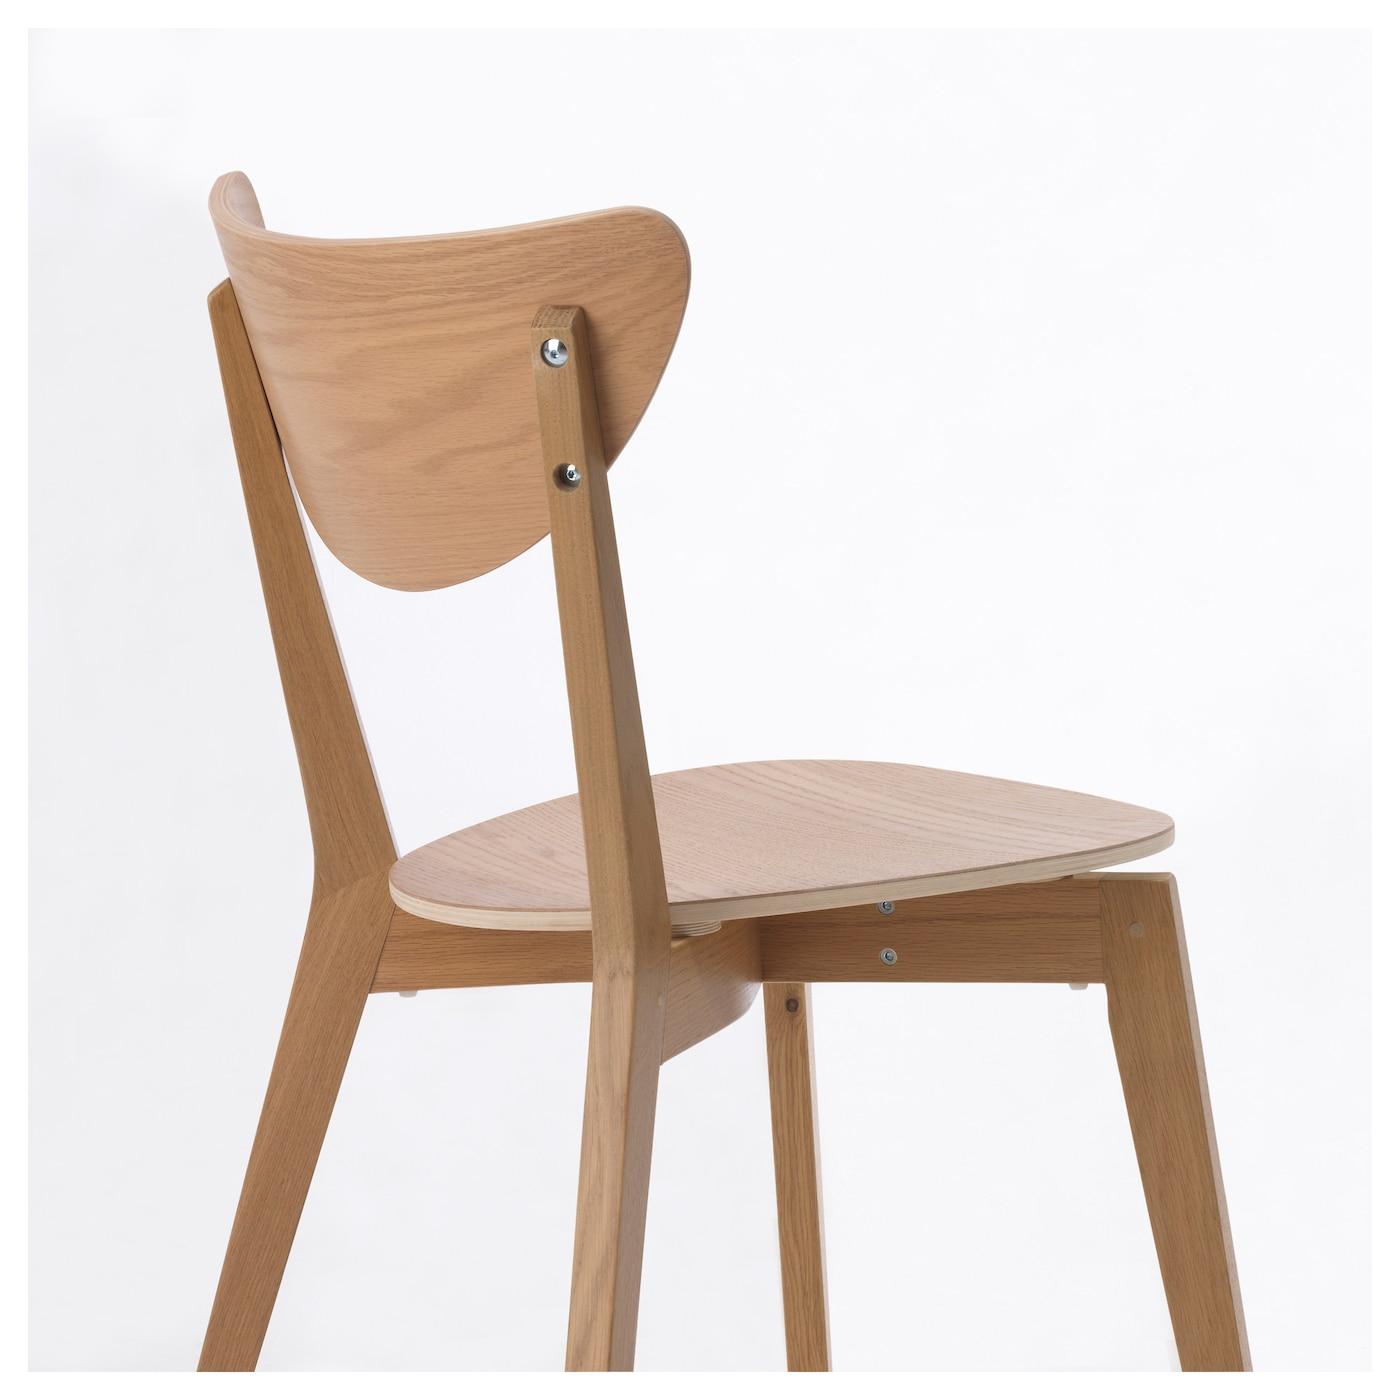 nordmyra chair oak ikea. Black Bedroom Furniture Sets. Home Design Ideas